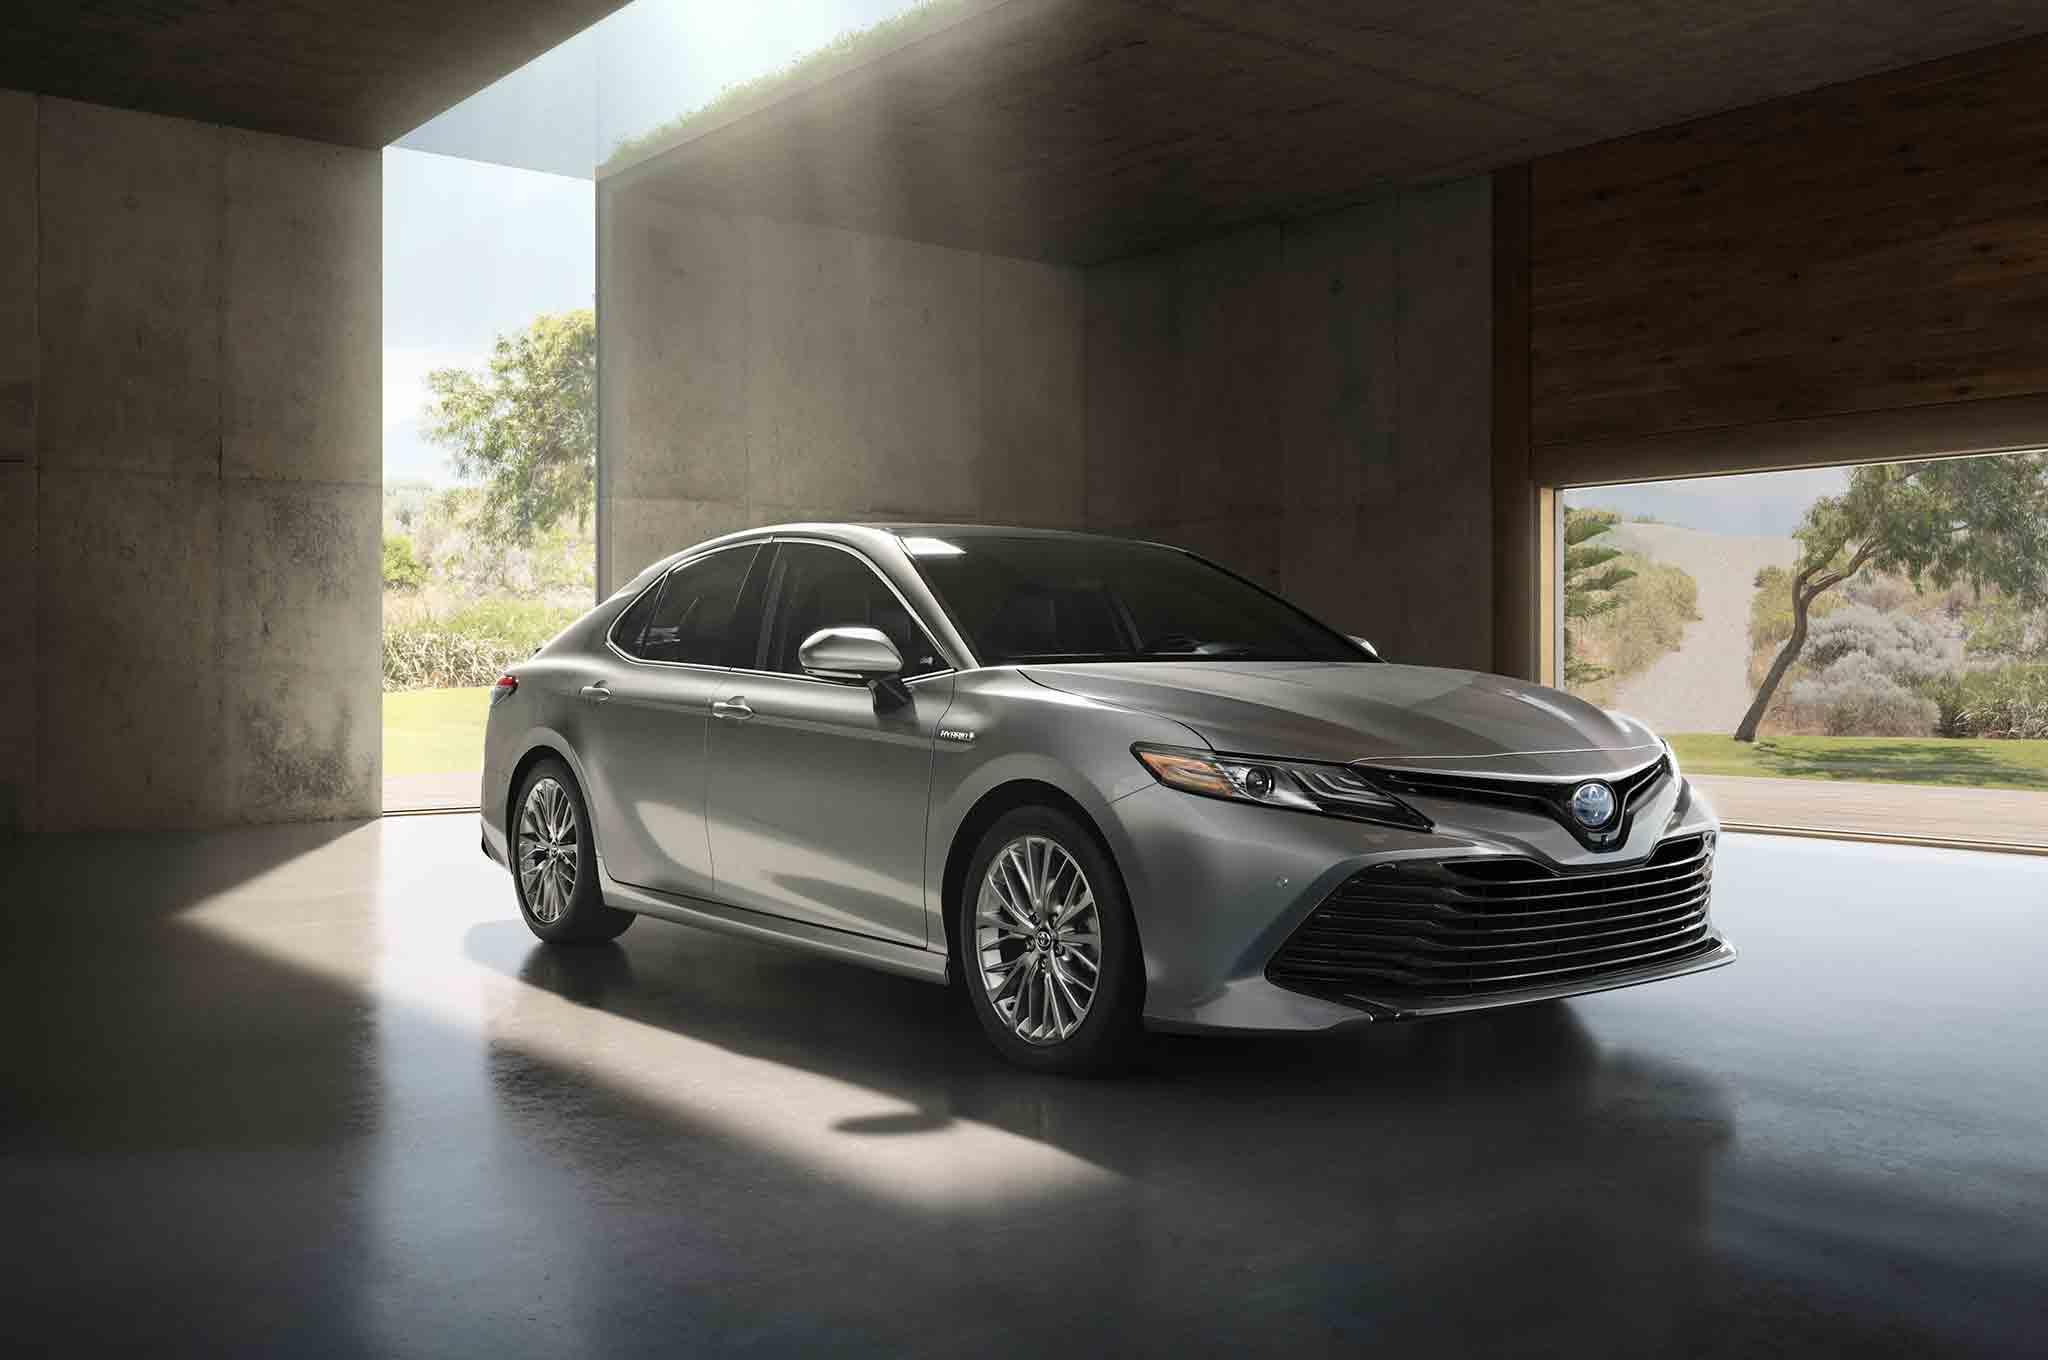 Toyota Camry: Coat hooks